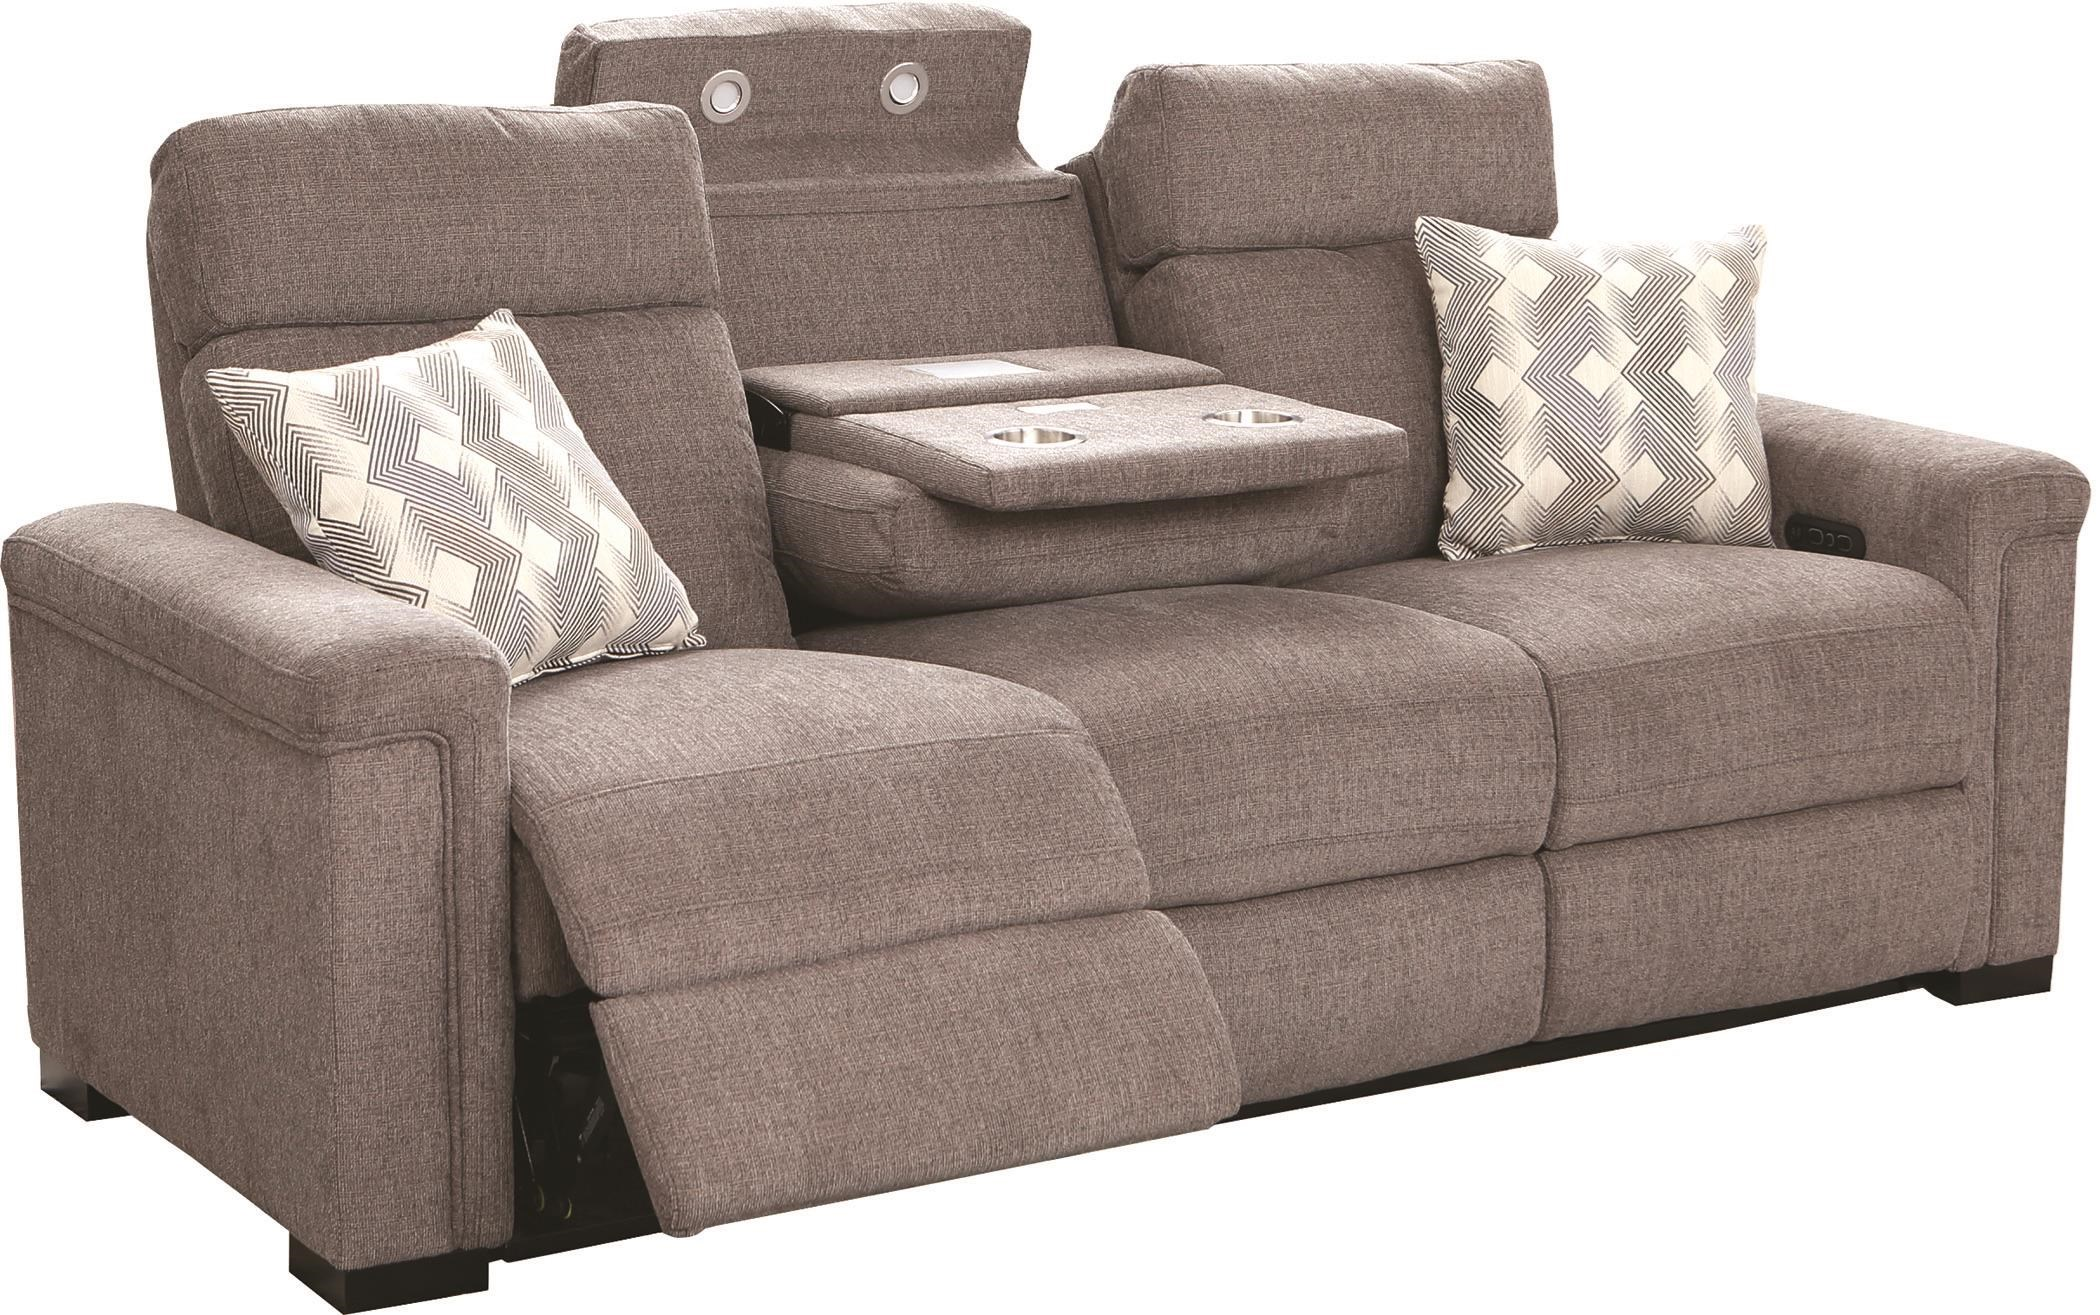 L470 Power Reclining Sofa W/Power Headrests and U by Lambor Furnishings at Darvin Furniture